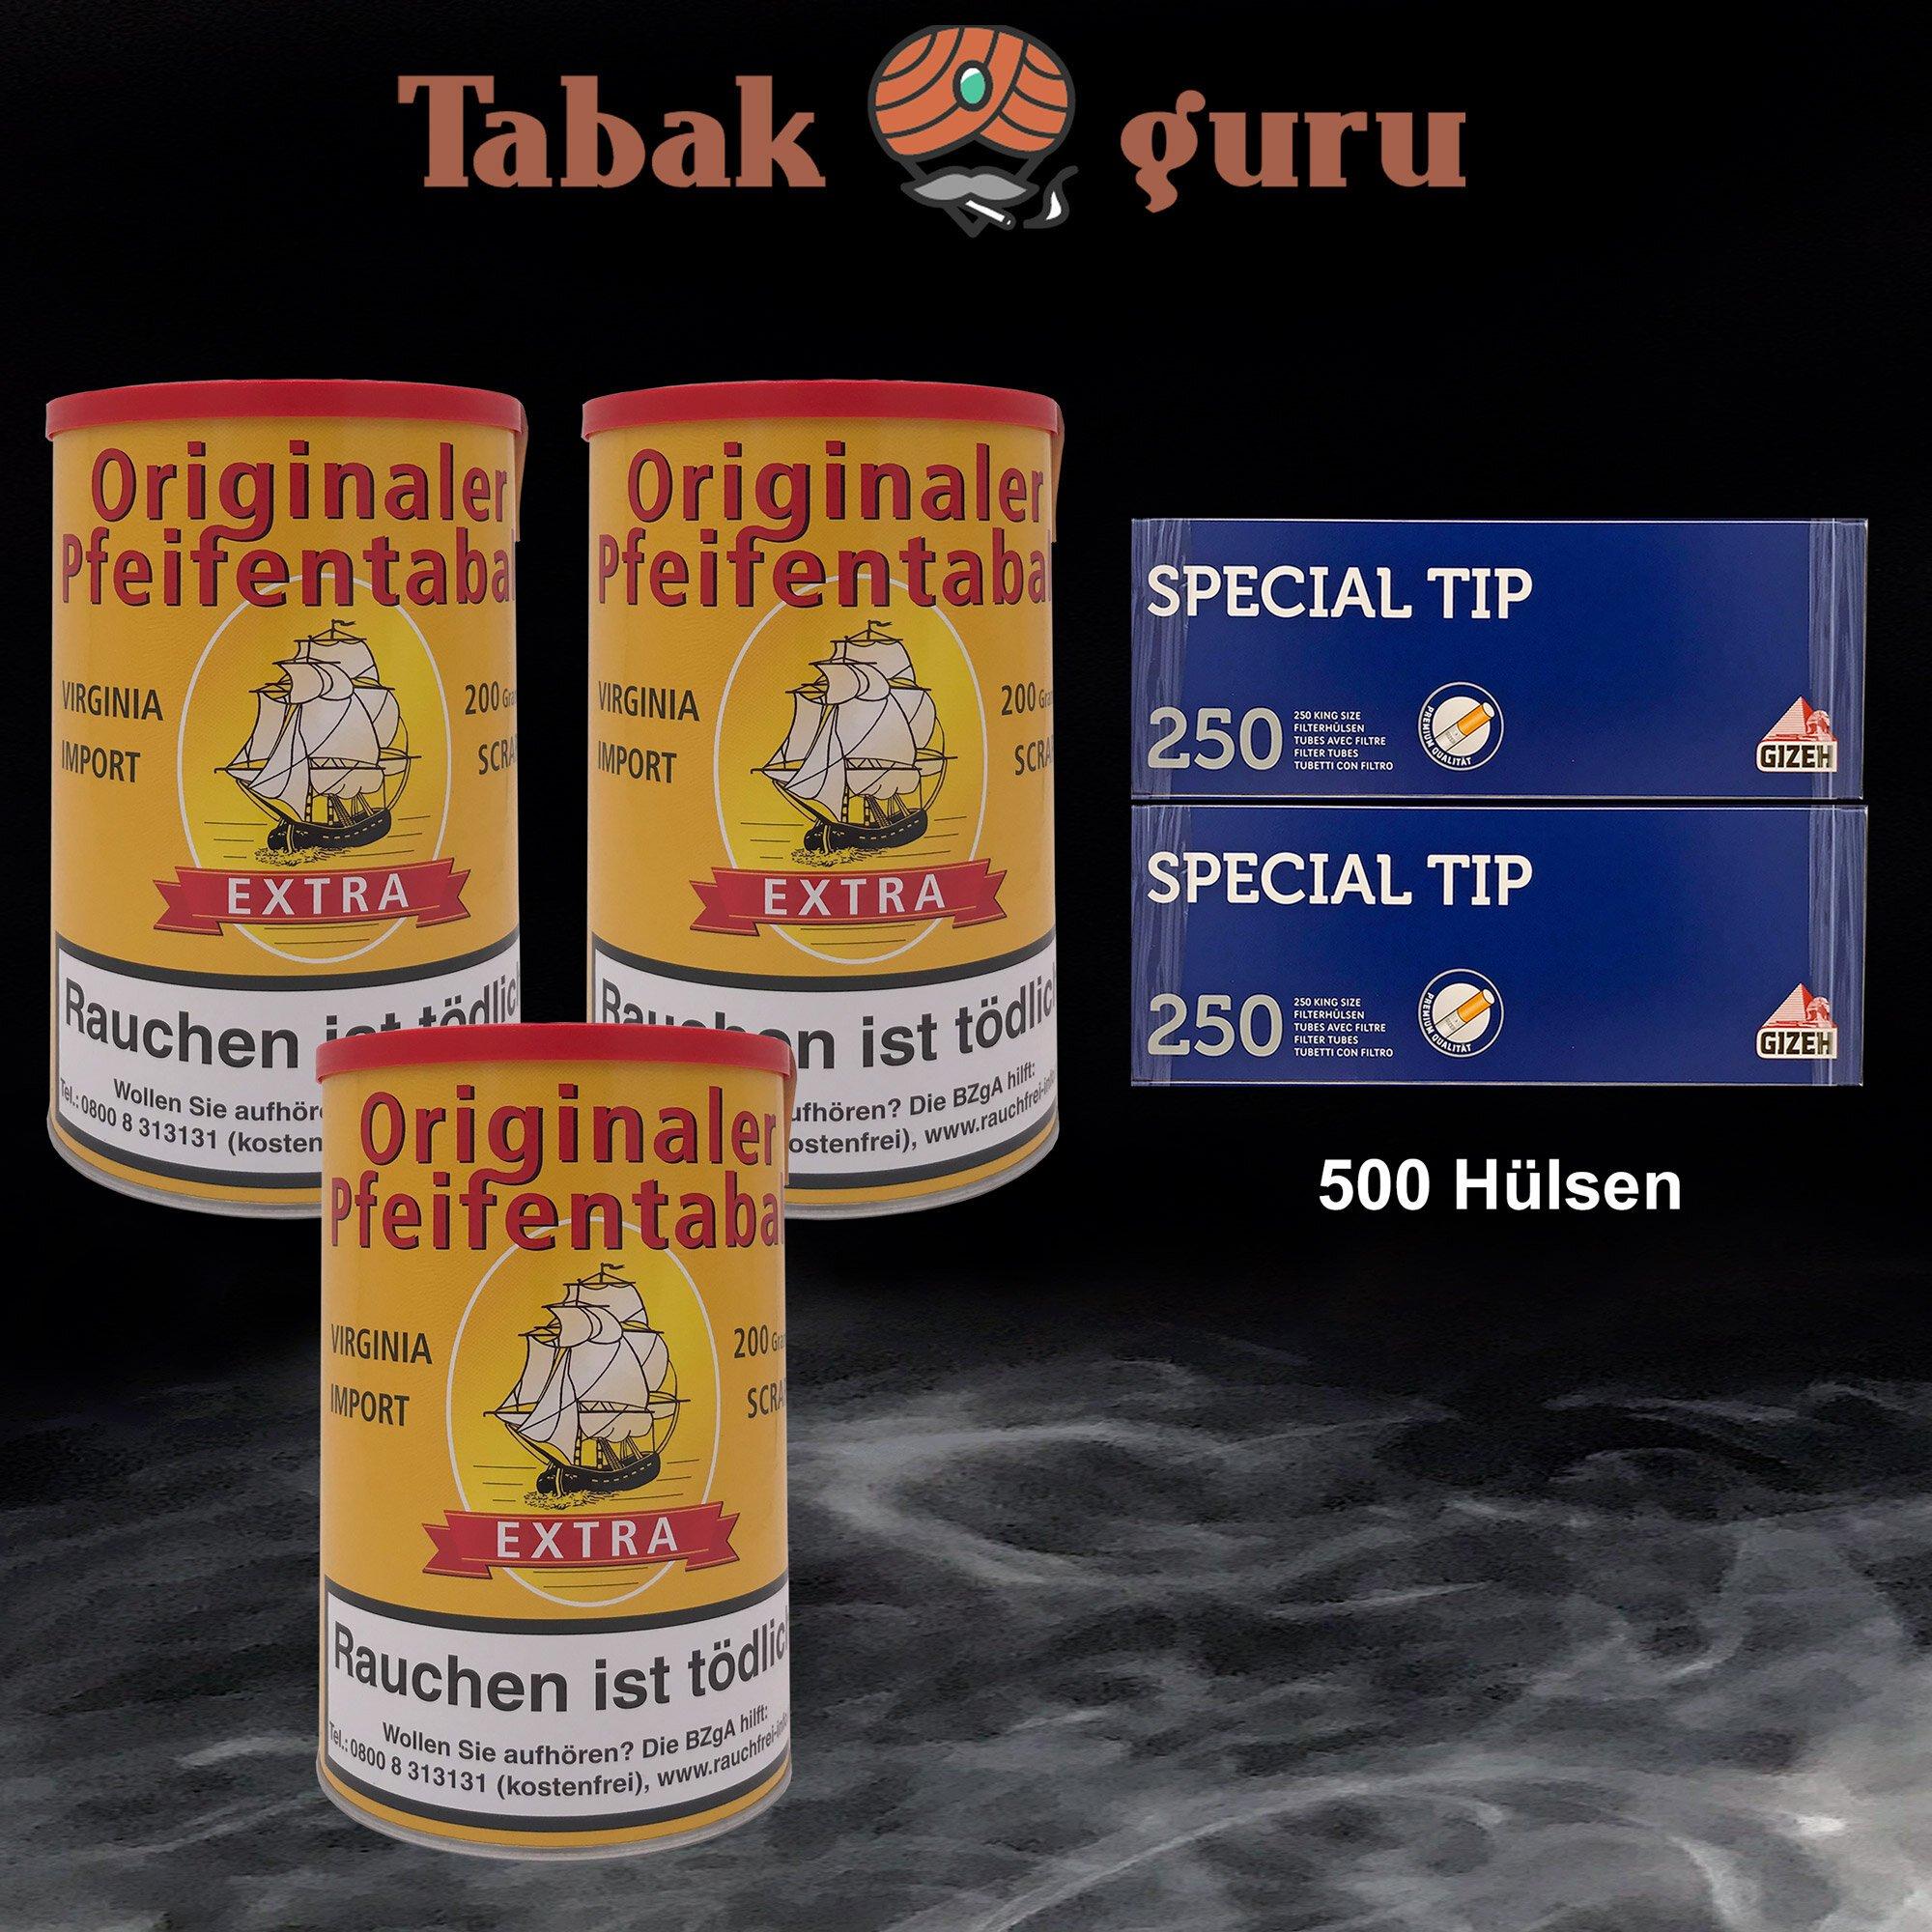 3 x Originaler Pfeifentabak Extra á 200g + 500 Gizeh Special Tip Hülsen